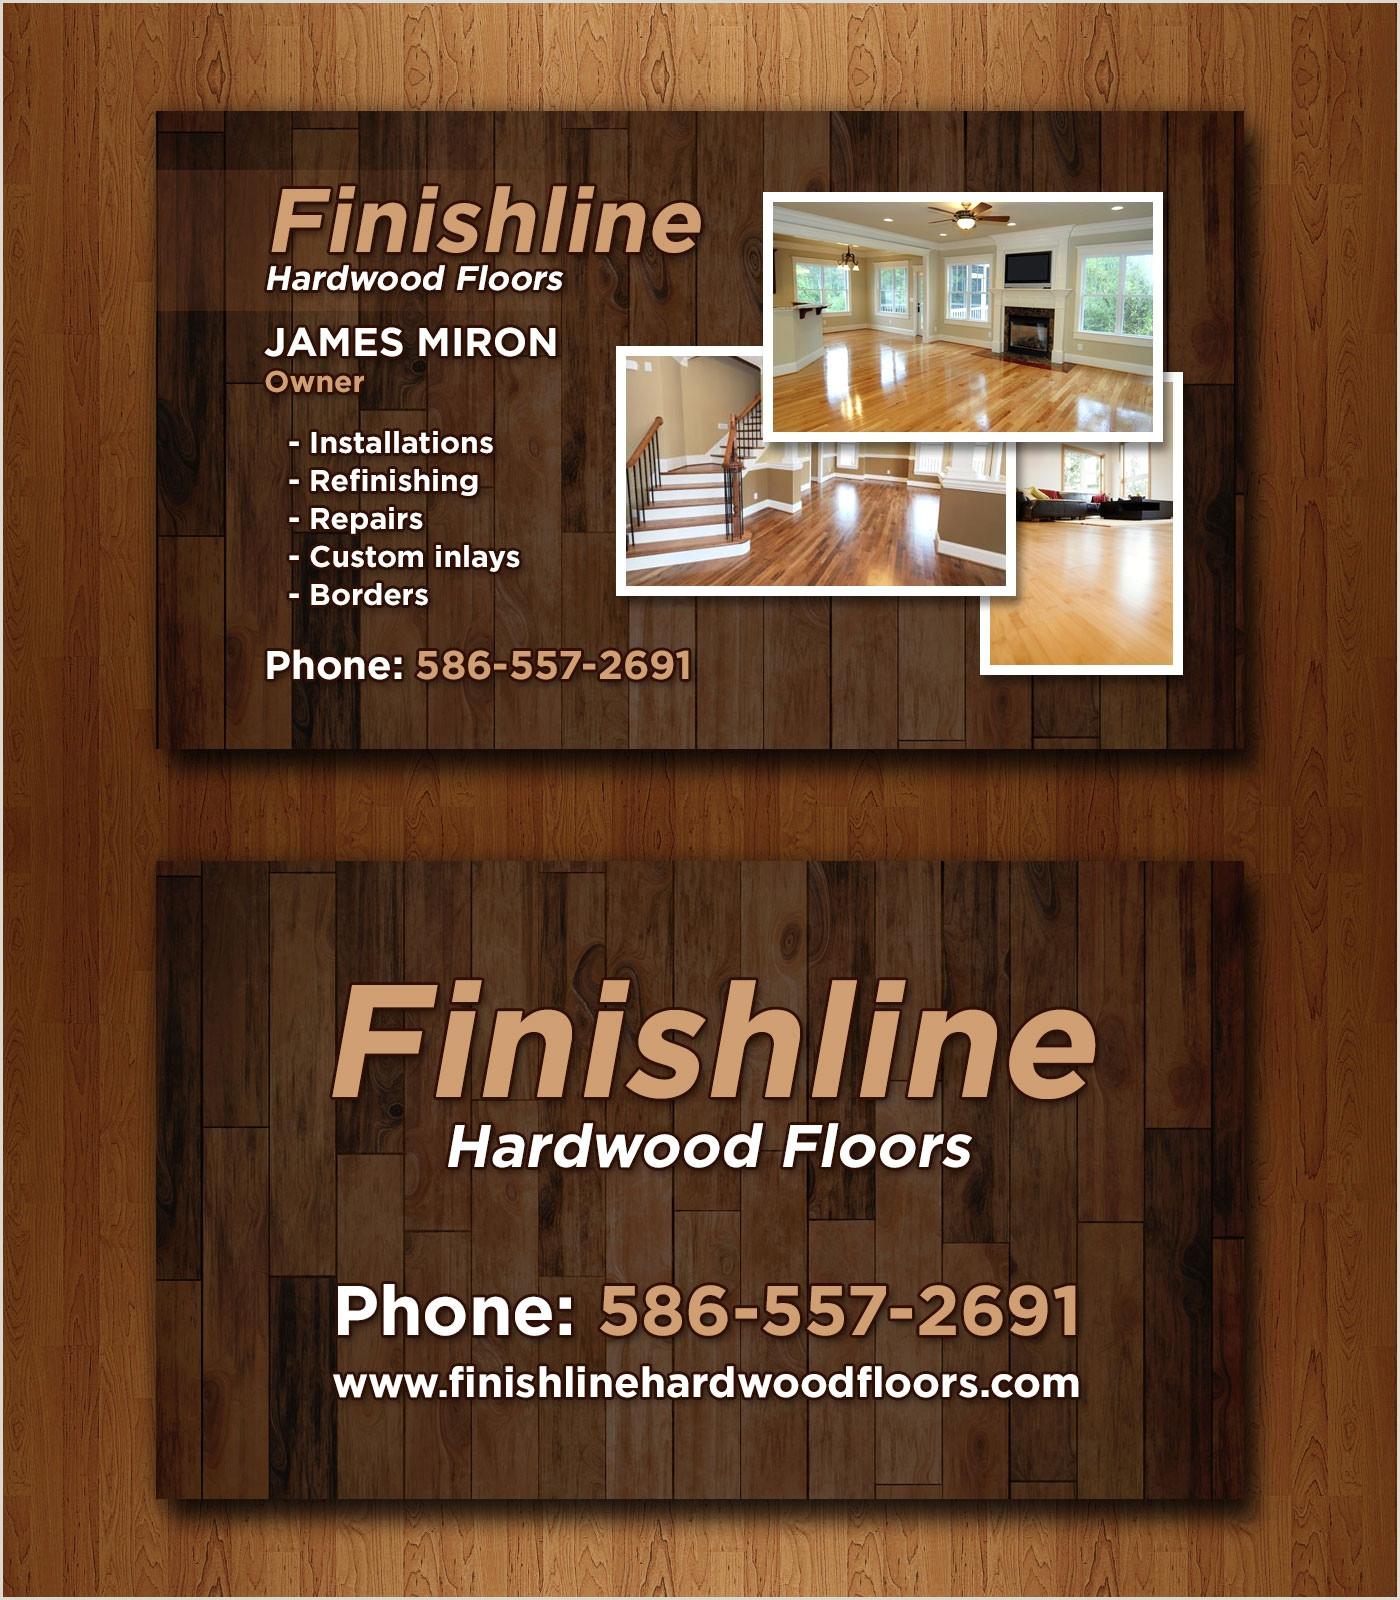 Unique Business Card Template 14 Popular Hardwood Flooring Business Card Template